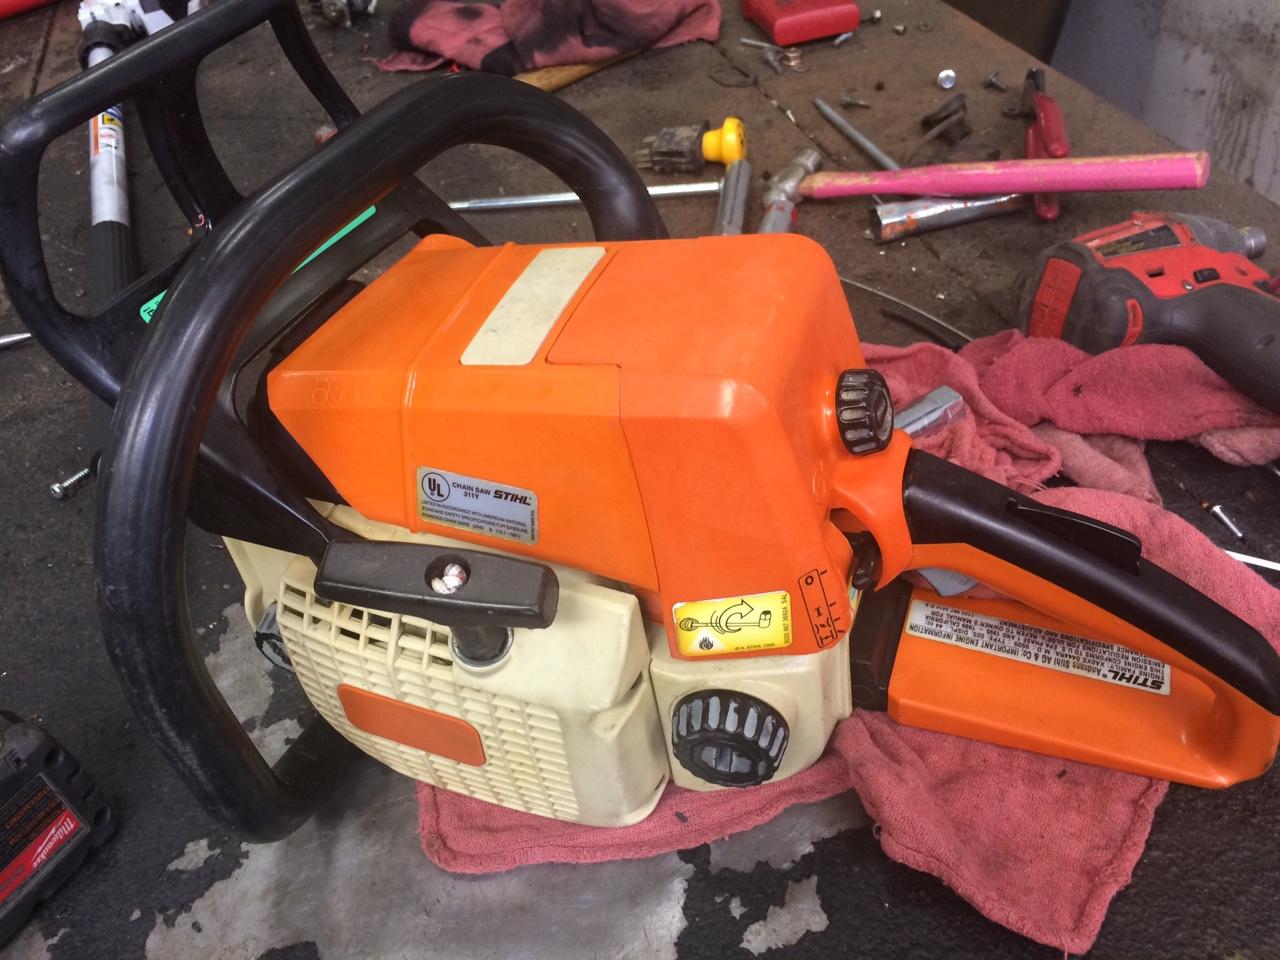 FarmerTec Huztl MS180/250 Complete Chainsaw Kit | Arboristsite com